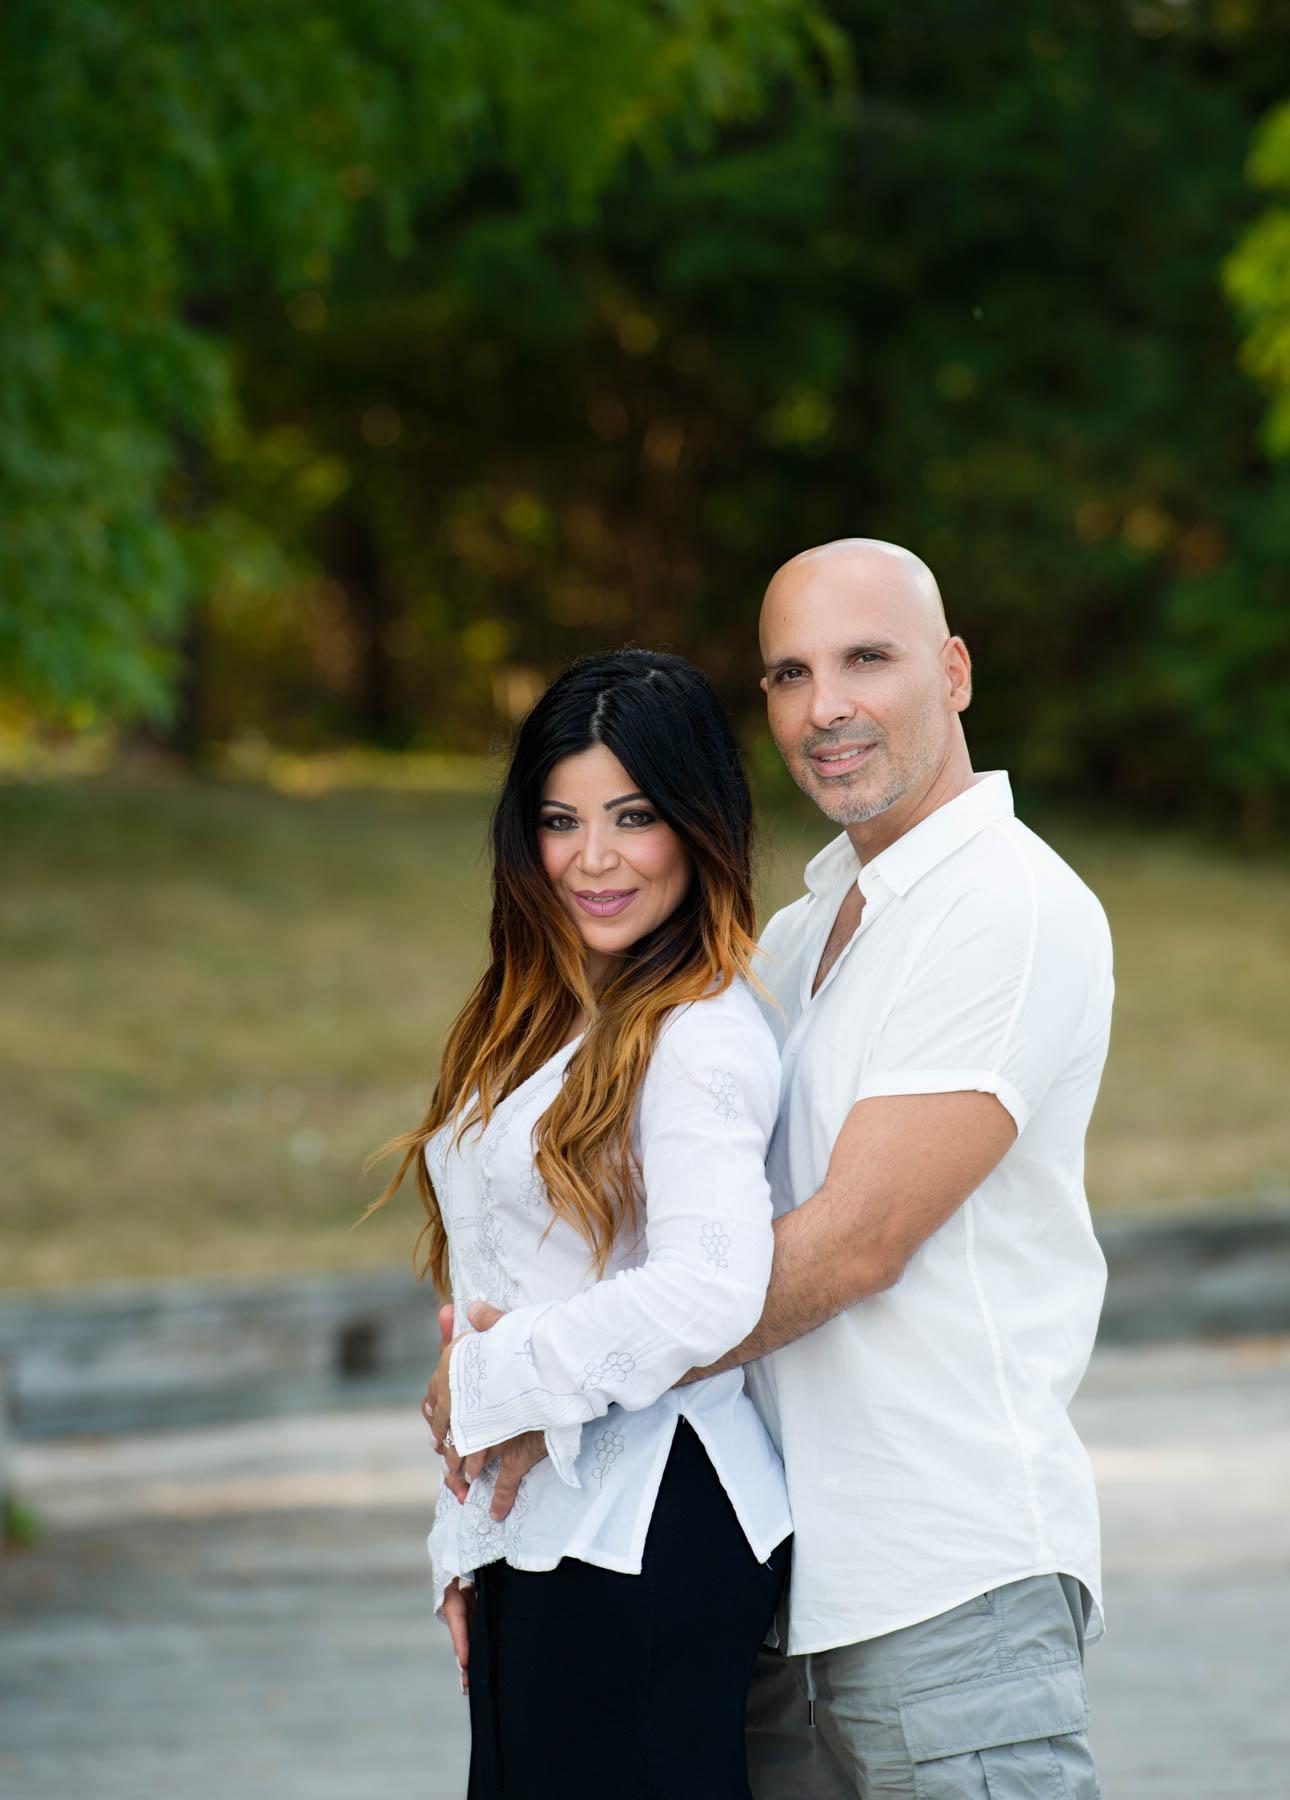 006 - Engagement FL Humber Bay Park - Toronto